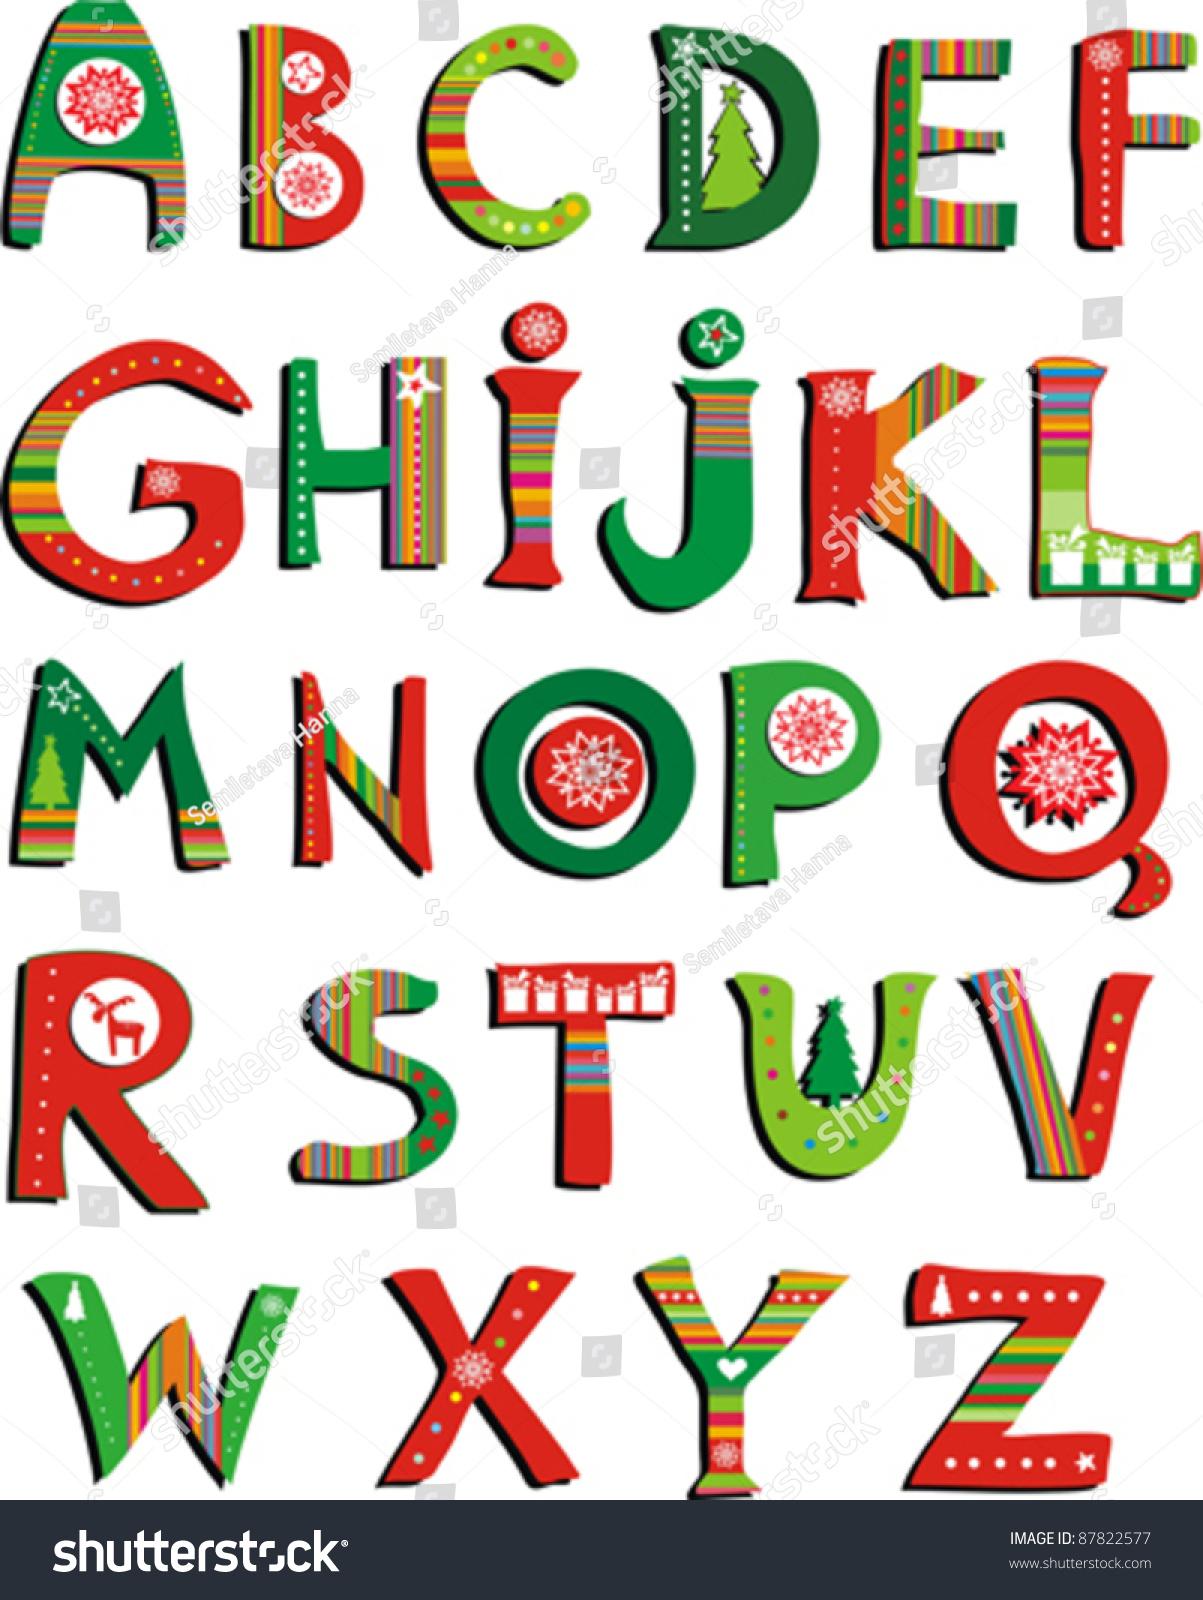 Abc Colorful Christmas Alphabet Isolated On Stock Vector 87822577 ...